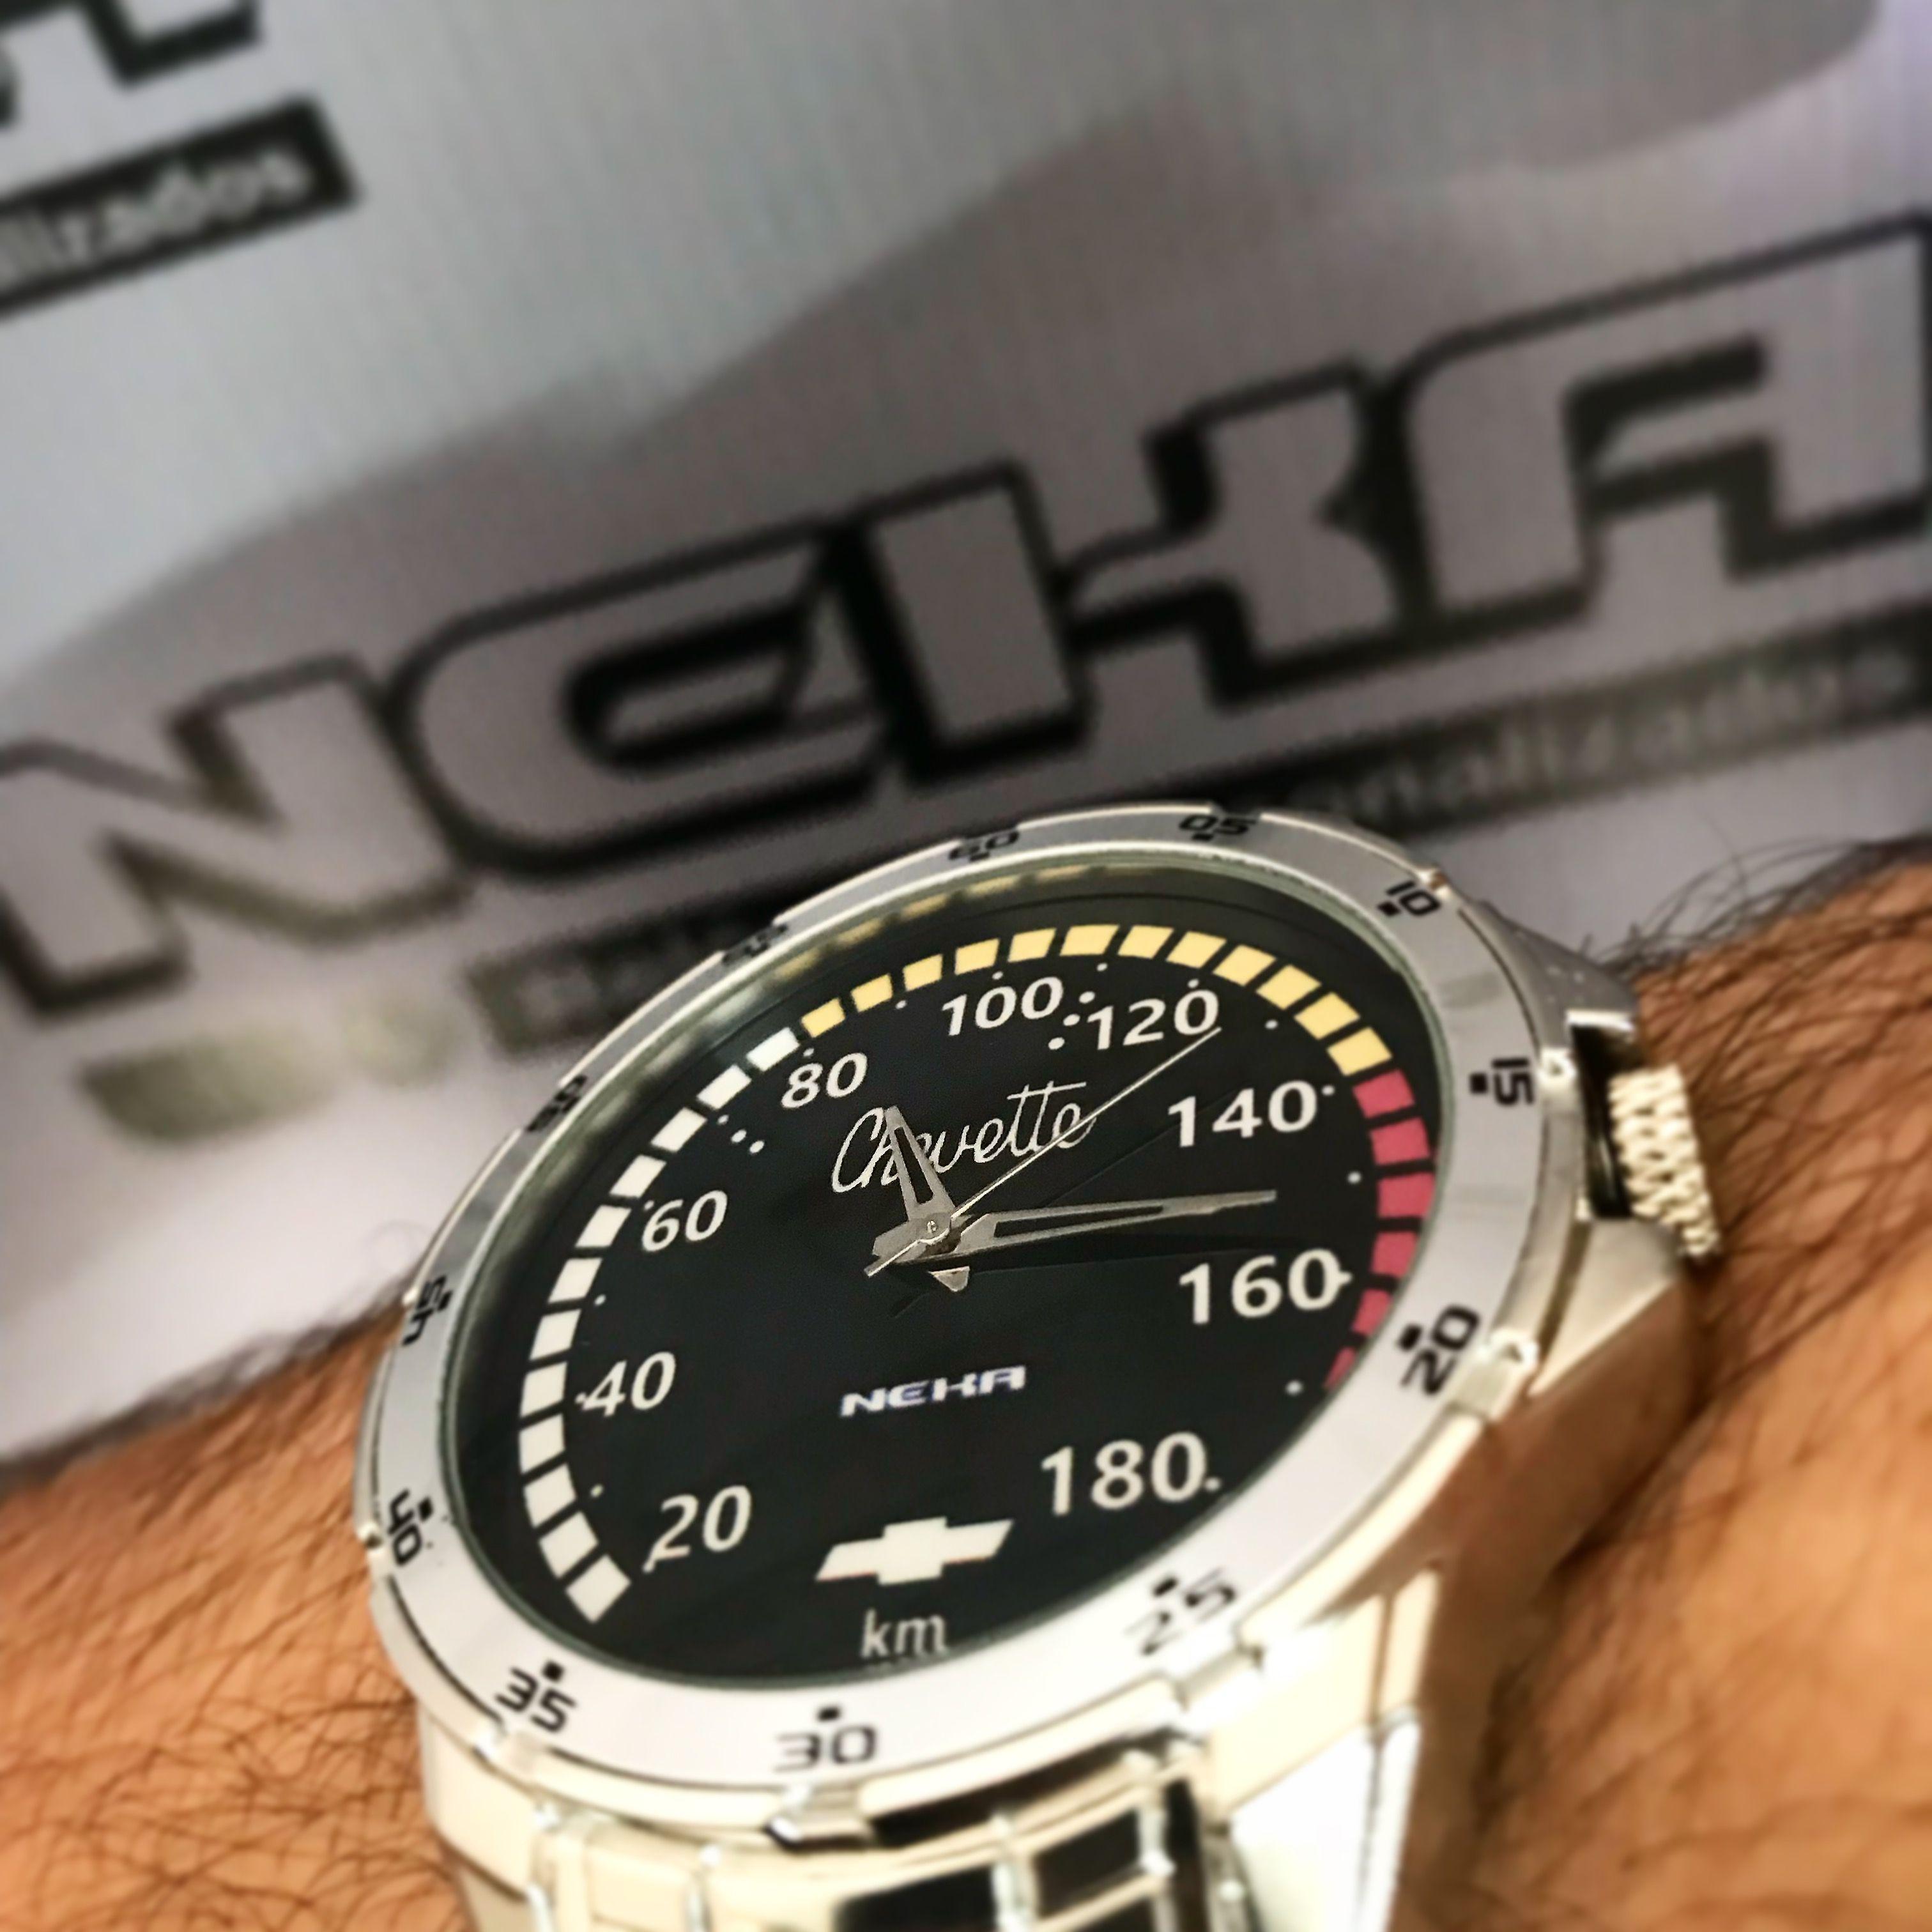 b181ff5a767 Relógio personalizado painel chevette